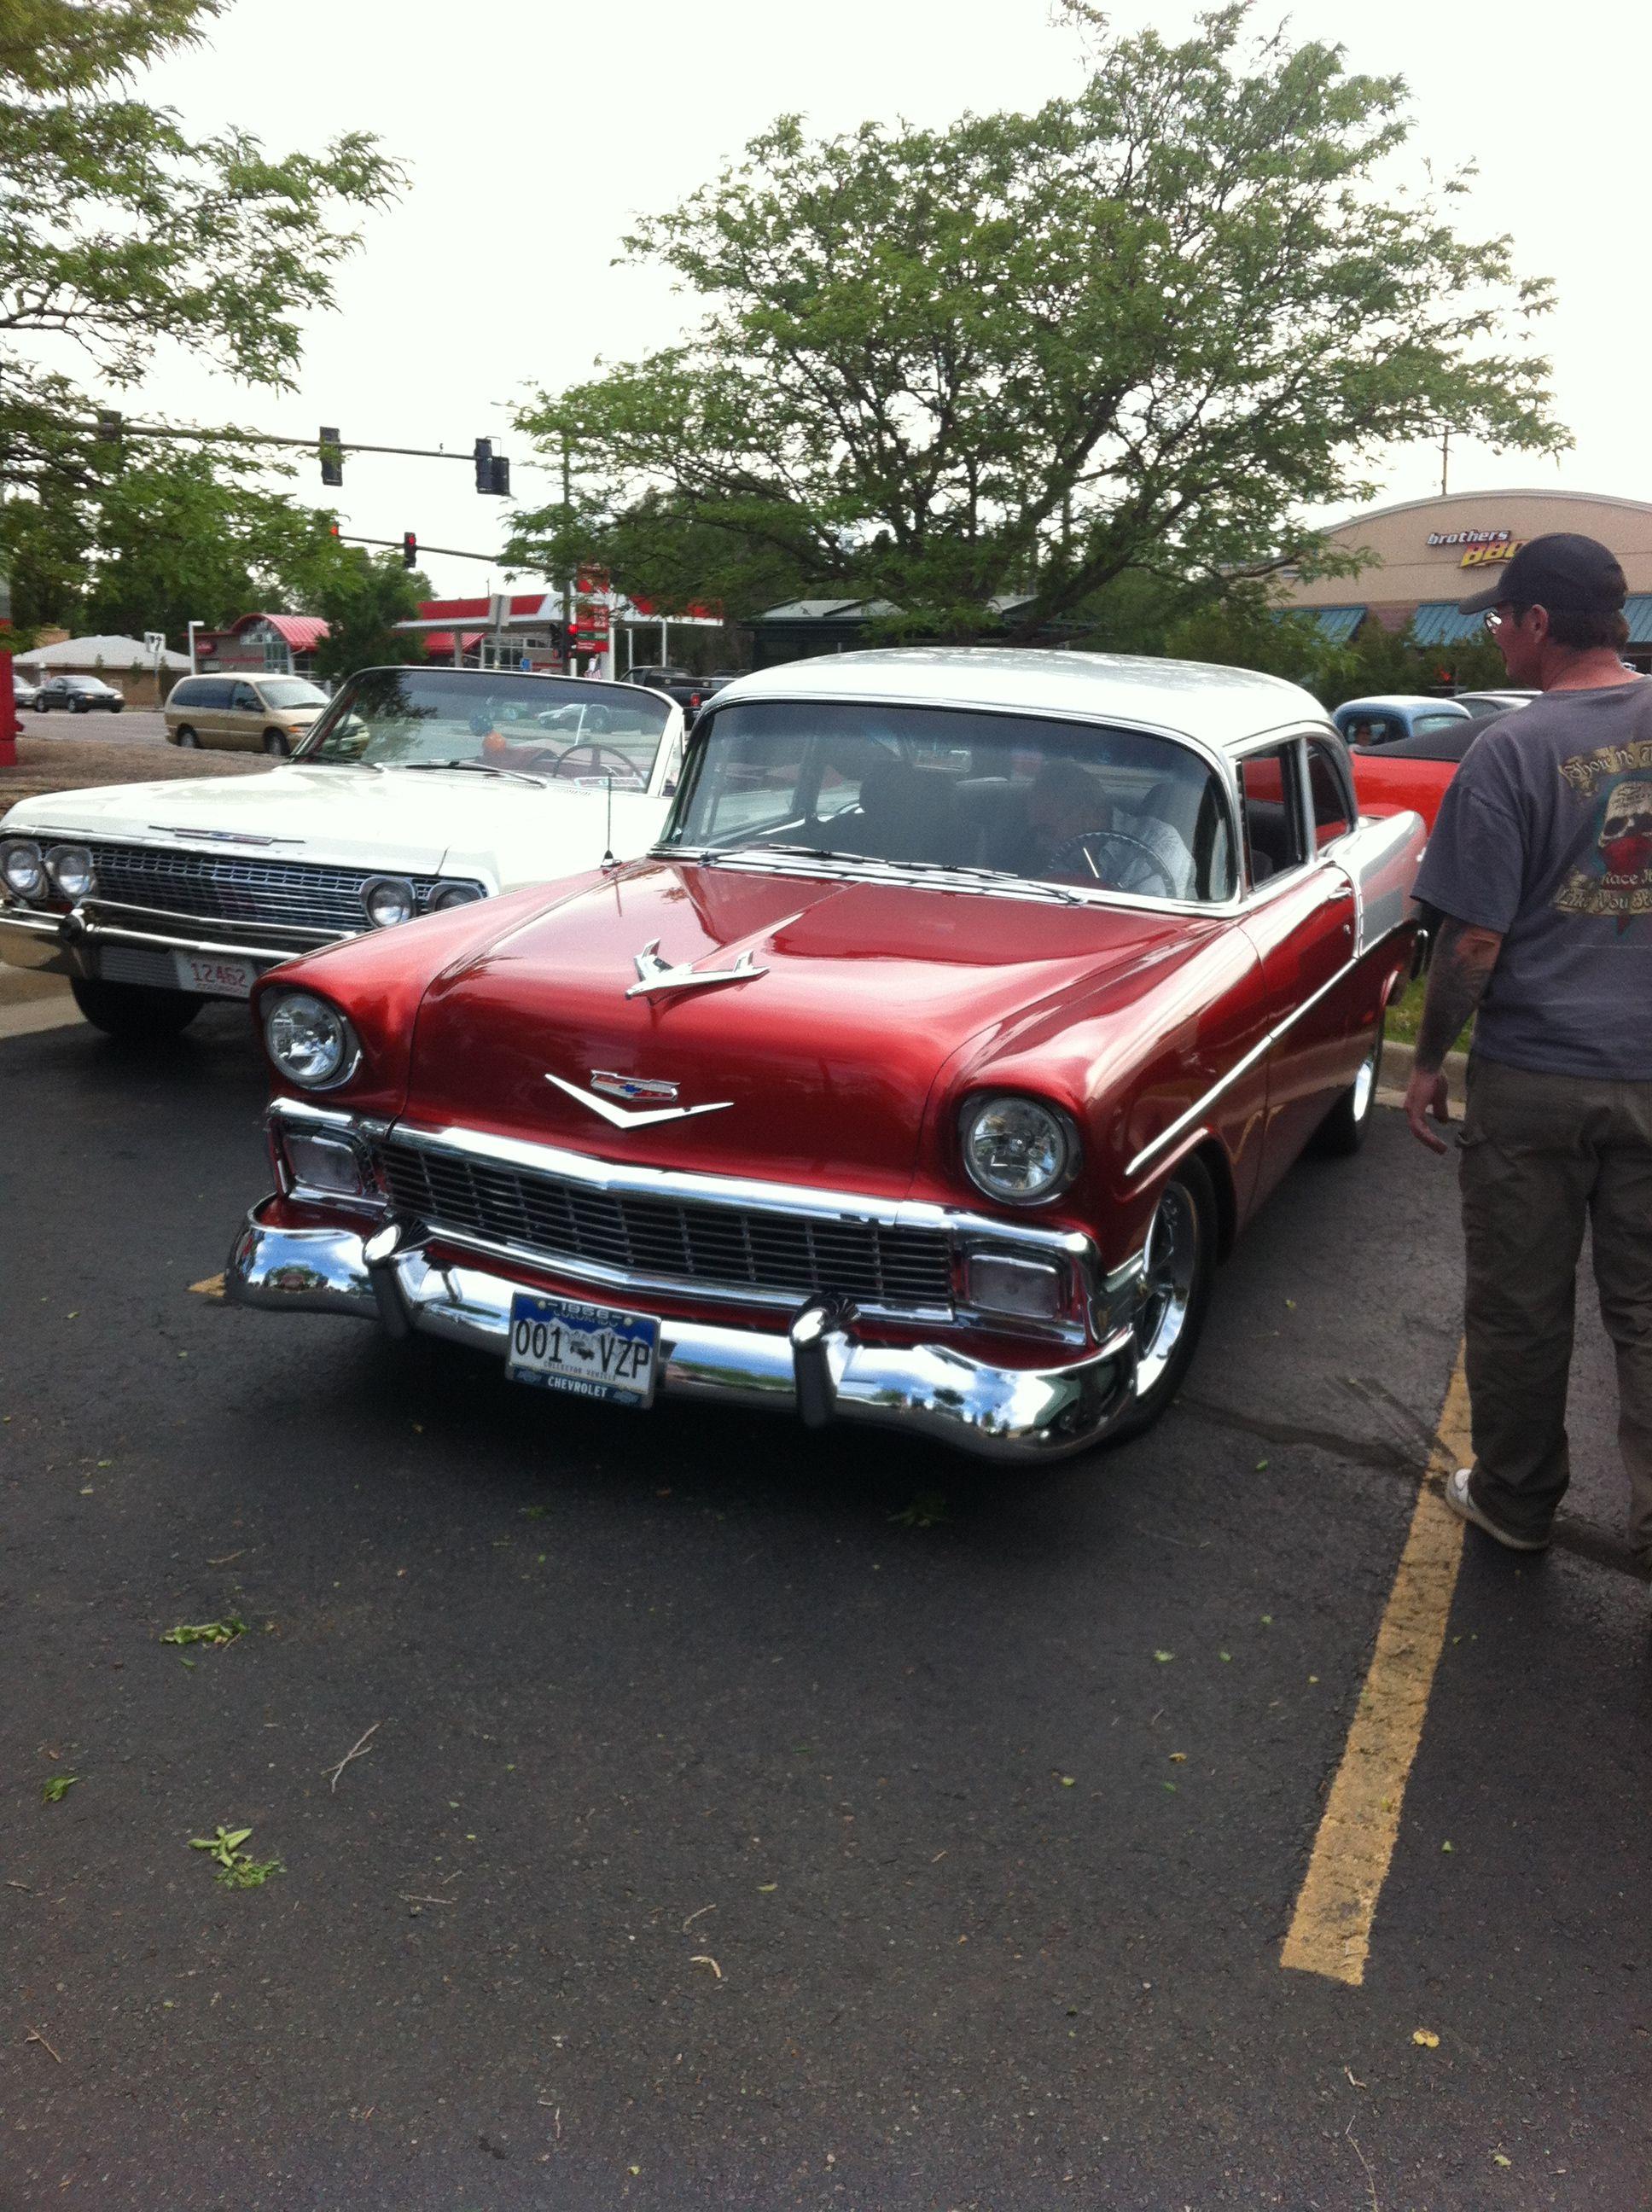 Car Cruise @ Borriello Brothers Lakewood 6/5/12